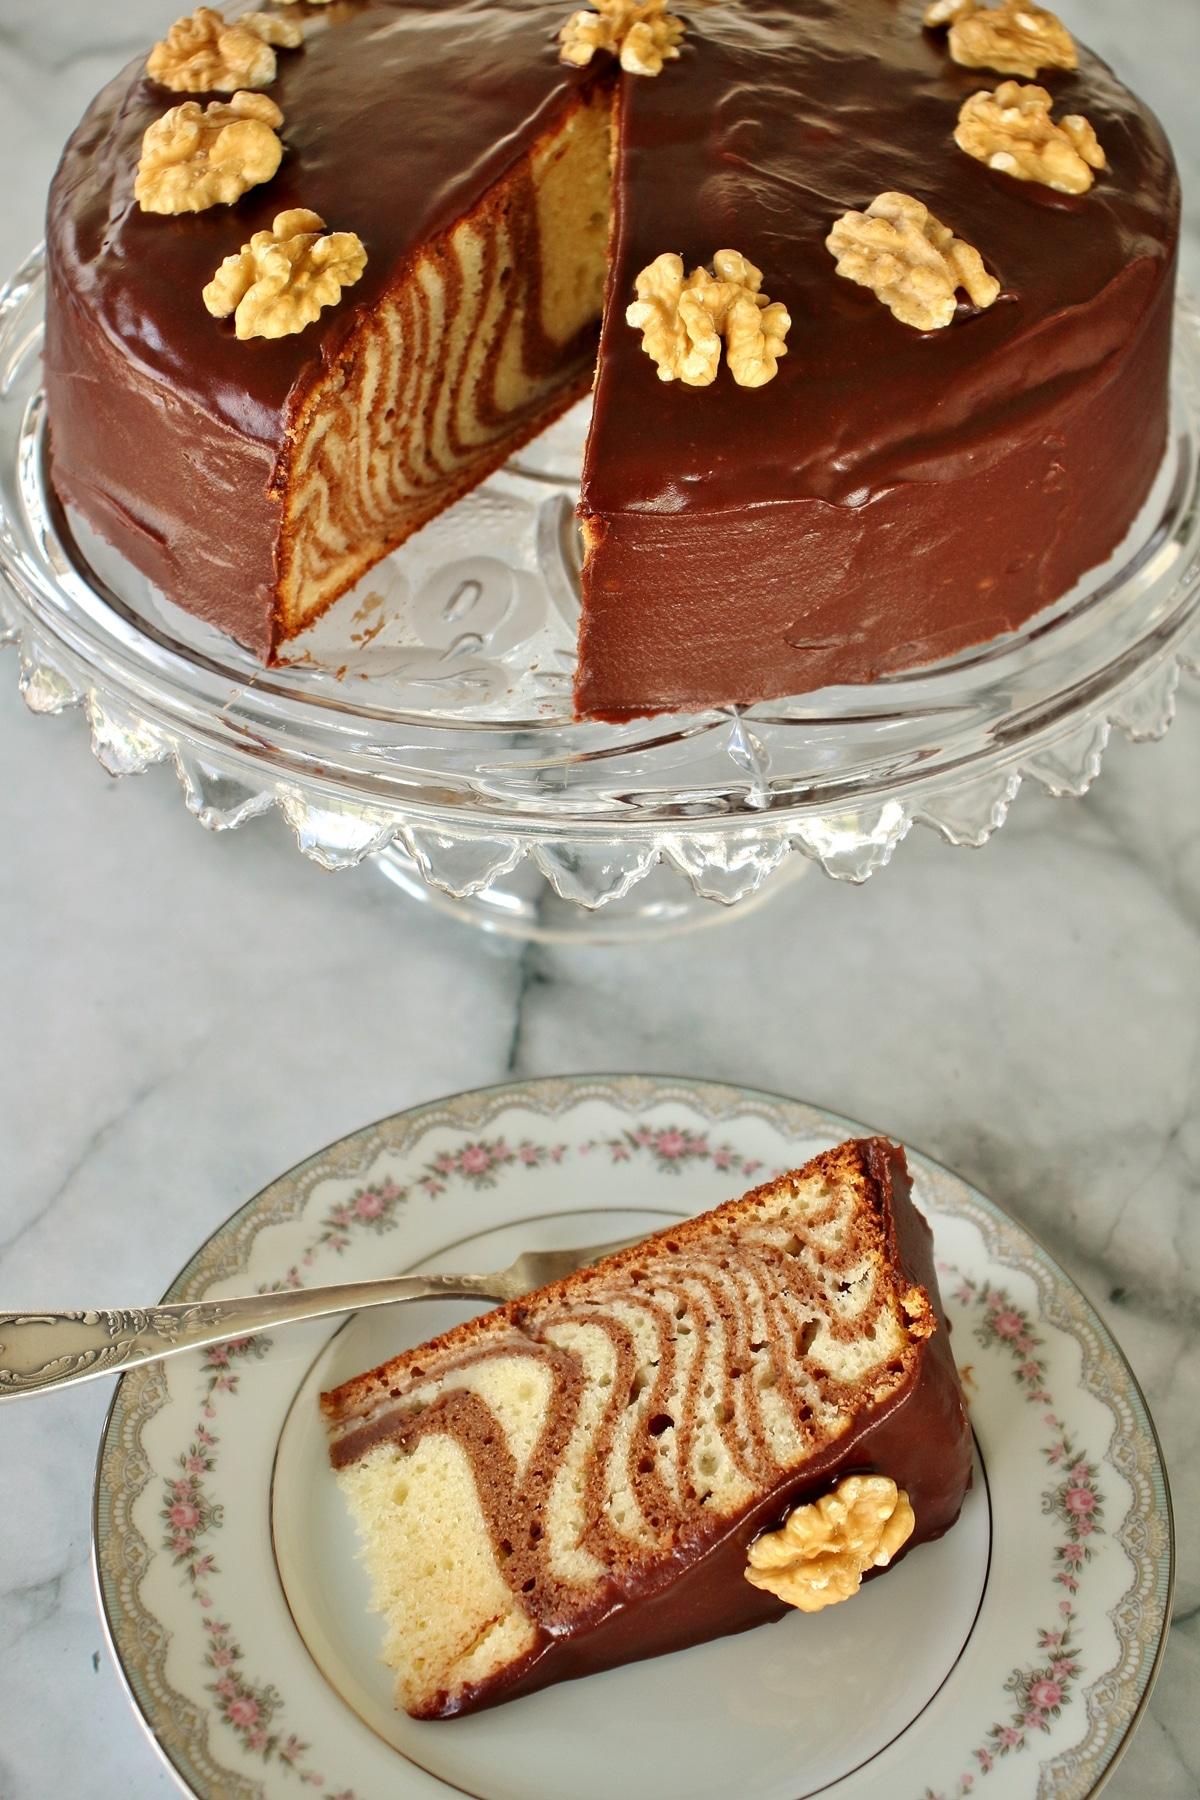 A chocolate glazed zebra cake on a crystal cake pedestal, with a slice of cake on a china plate next to it